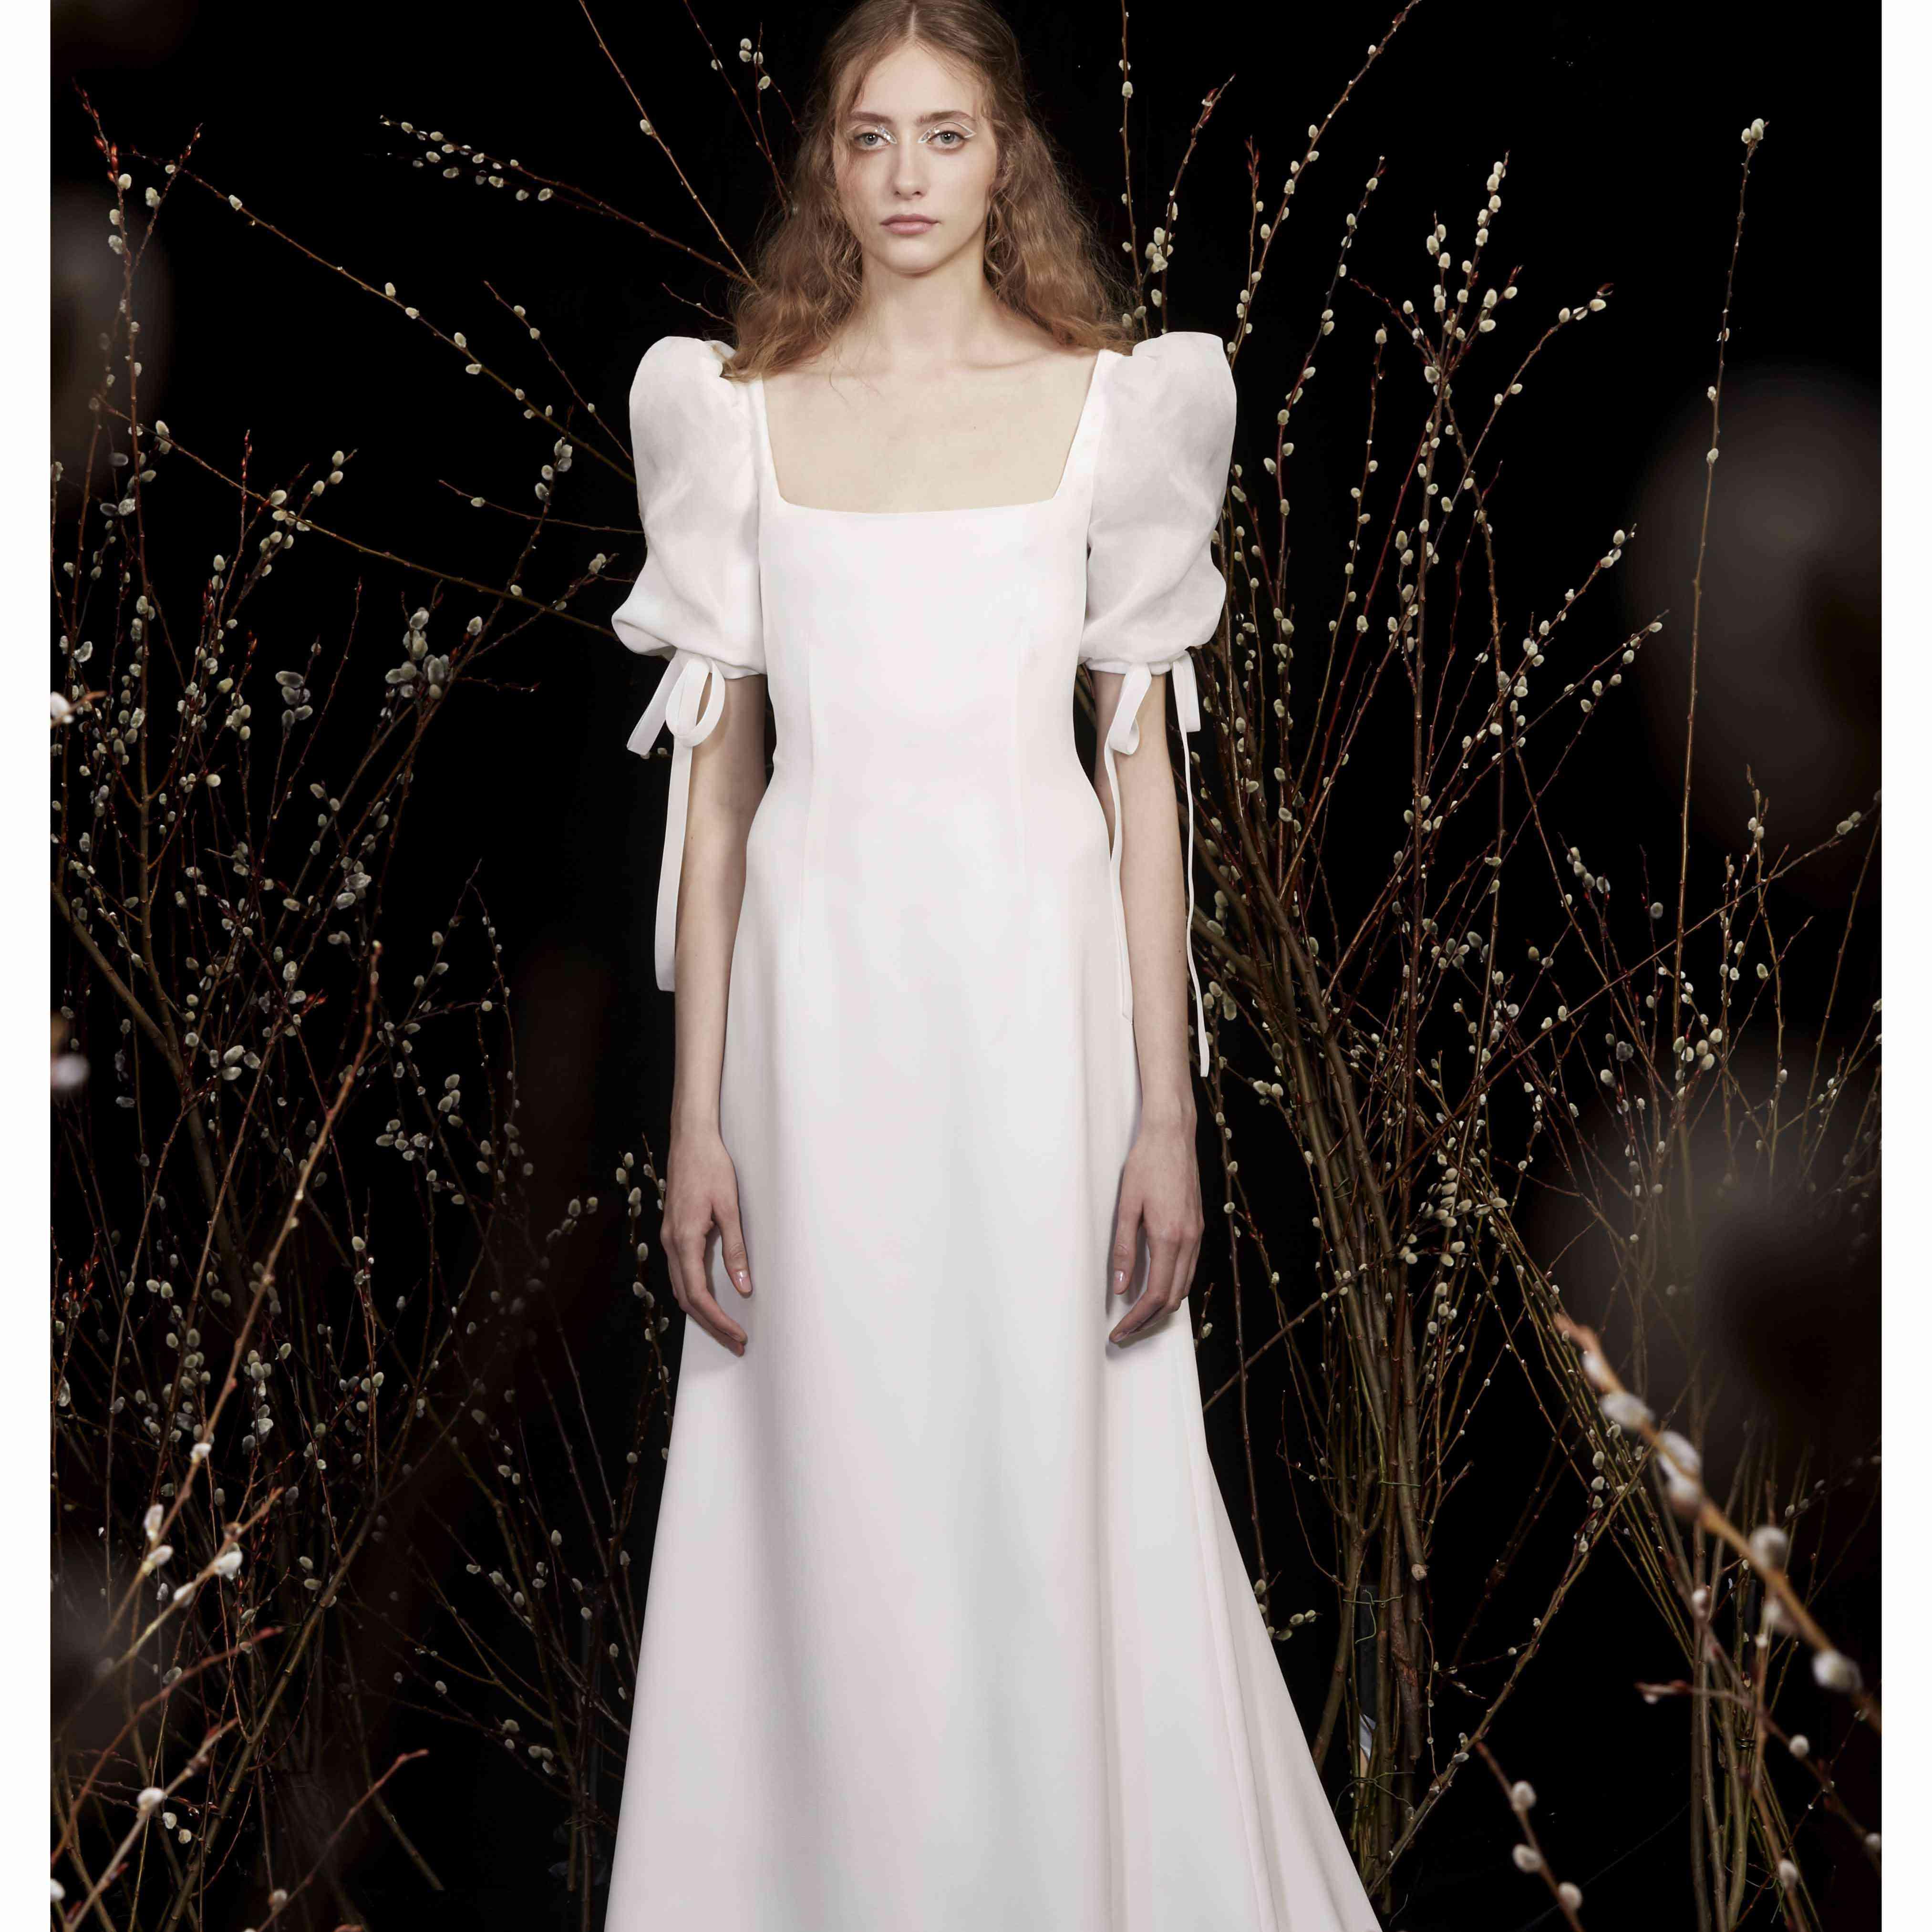 Model in square neckline wedding dress